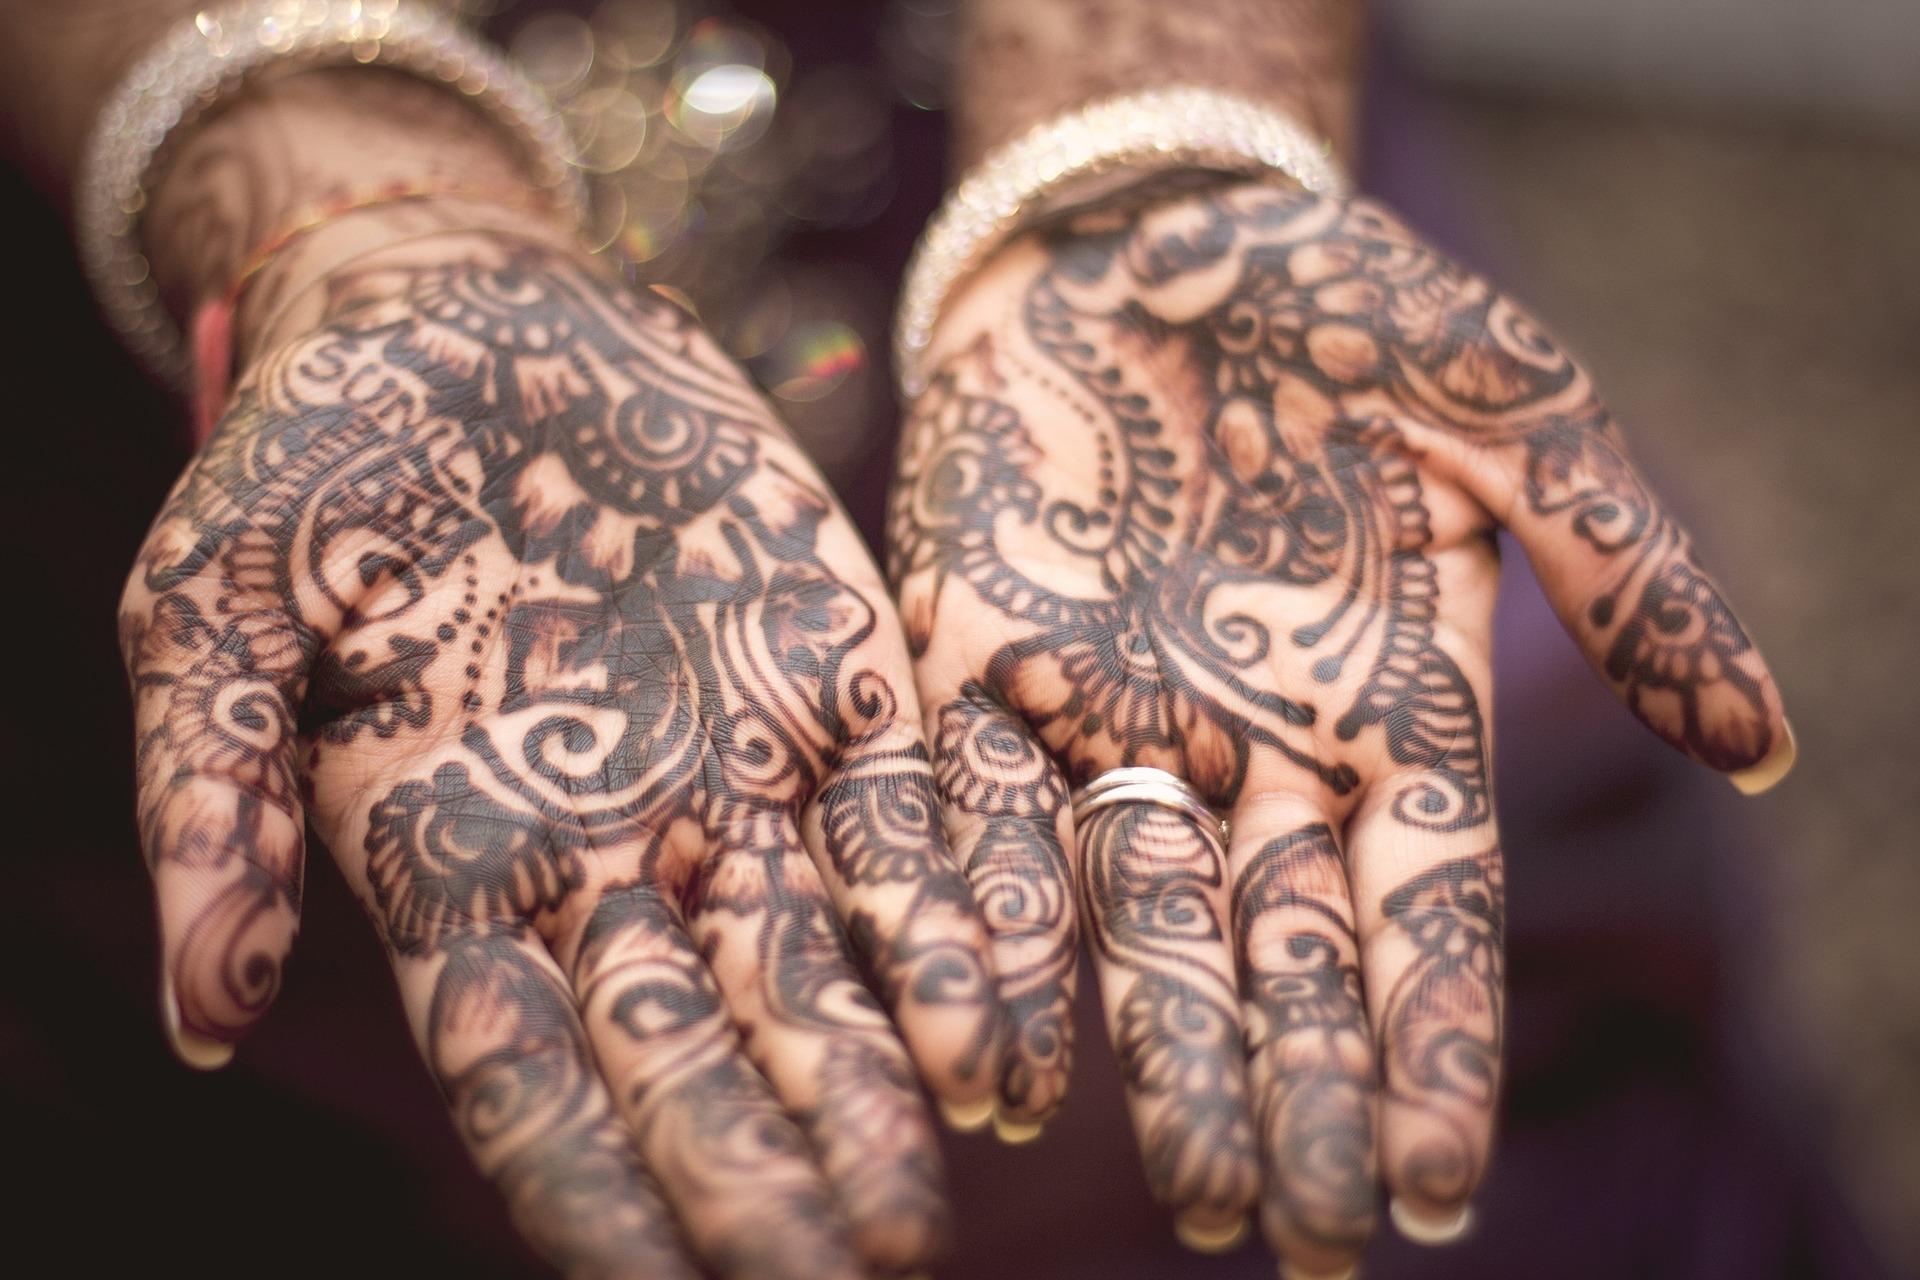 How To Avoid Fraud On Online Matrimony Websites